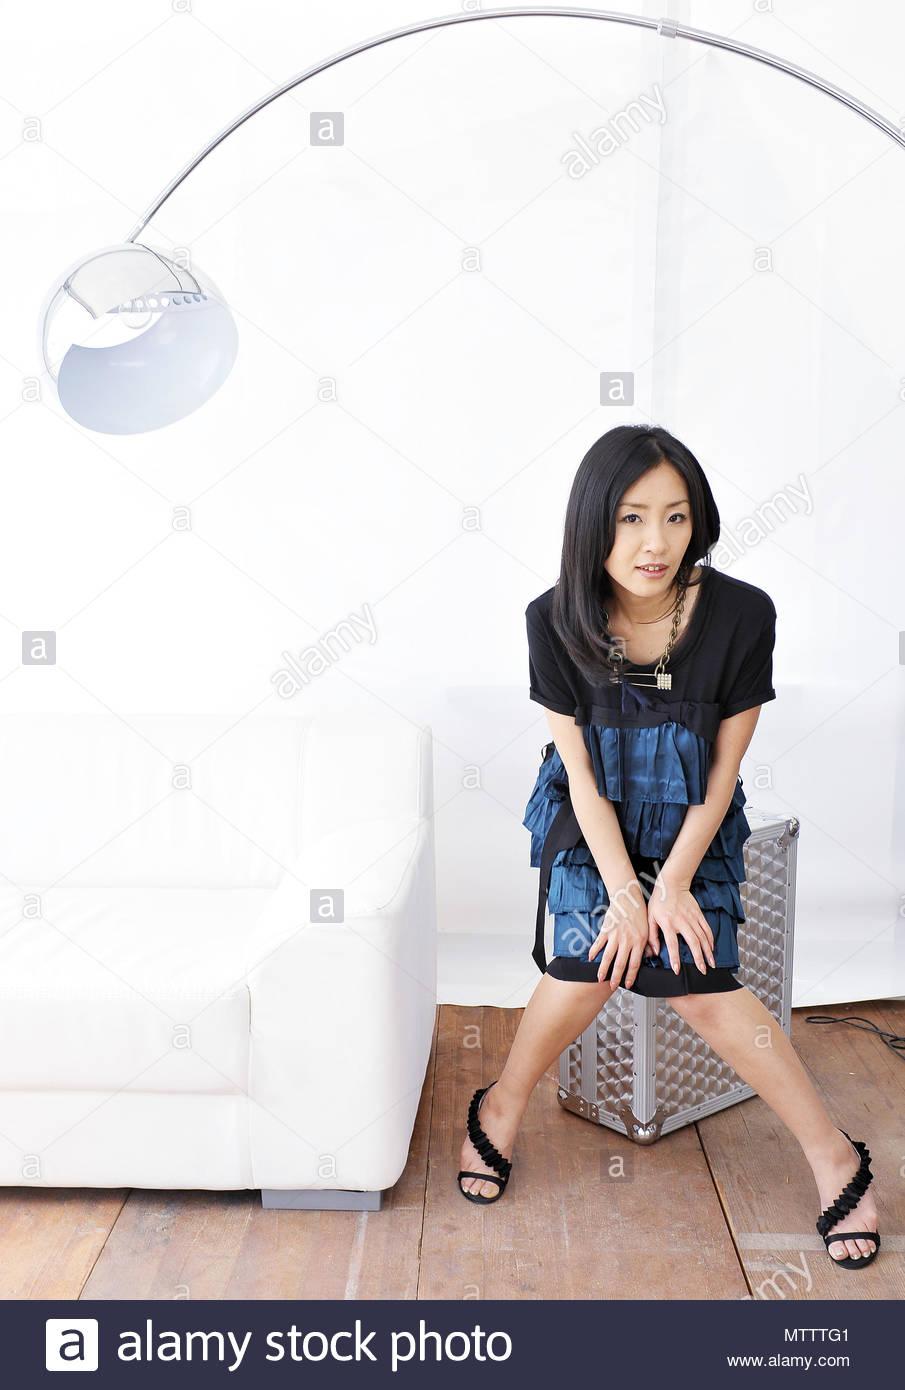 Forum on this topic: Lisa Marie Varon, megumi-kagurazaka/